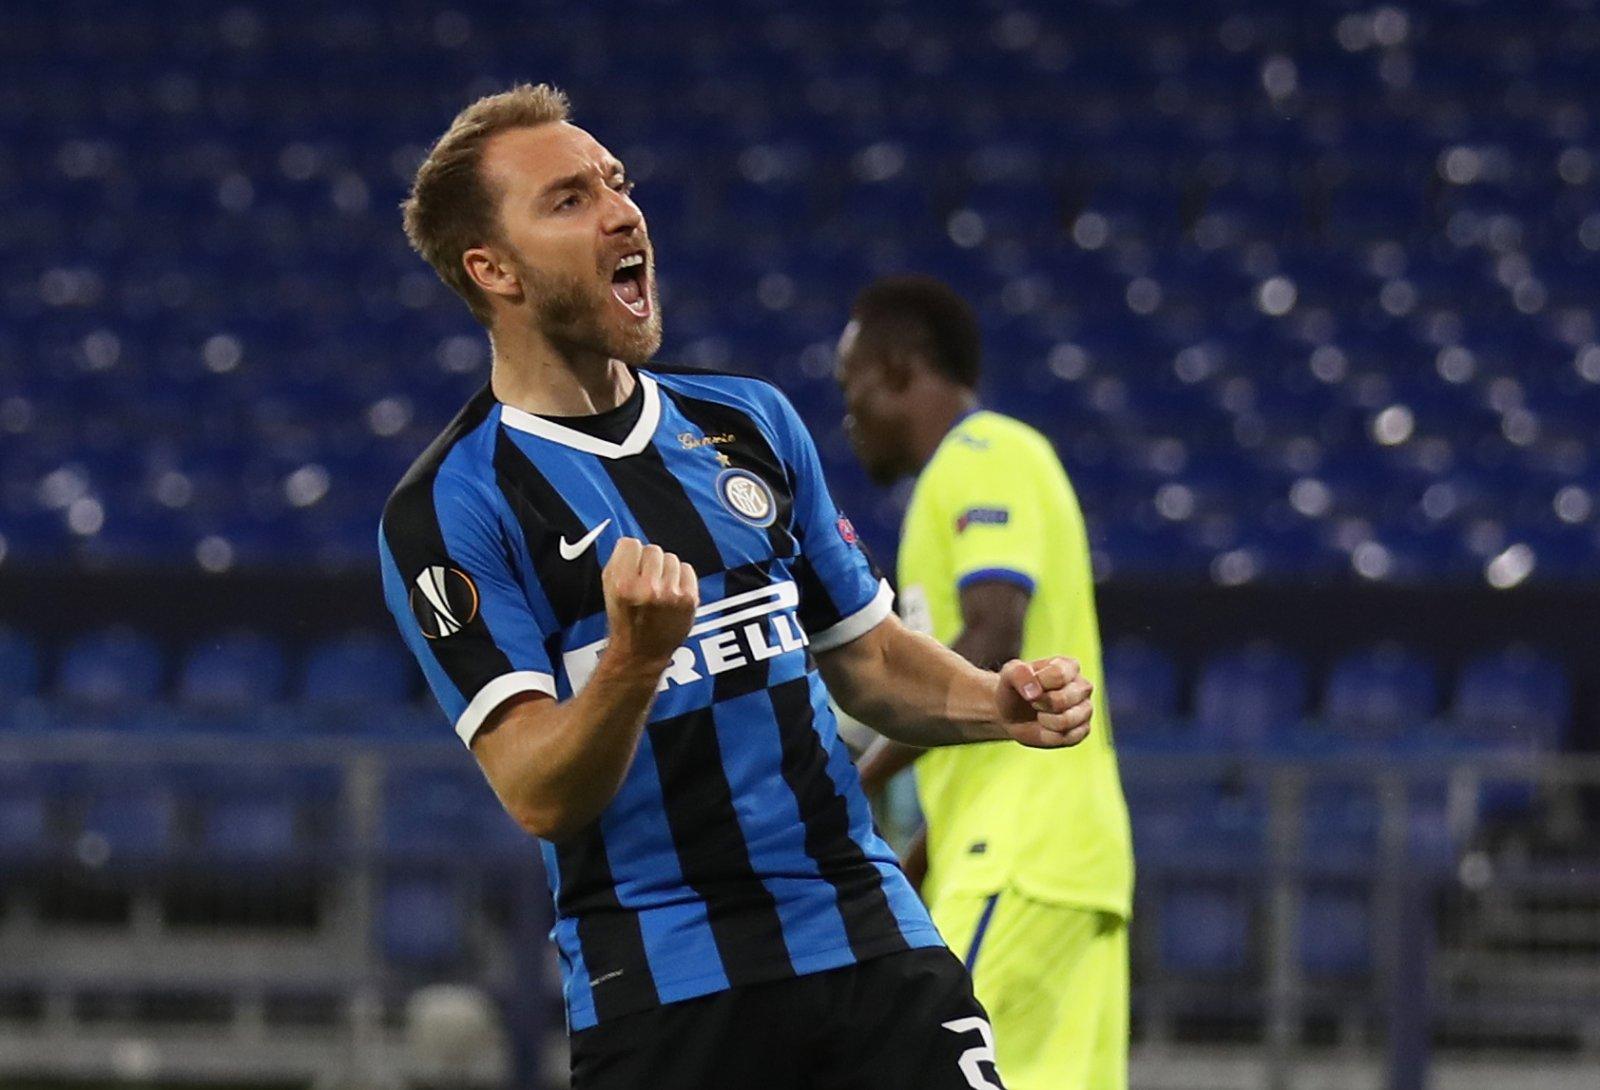 Christian-Eriksen-celebrates-scoring-for-Inter